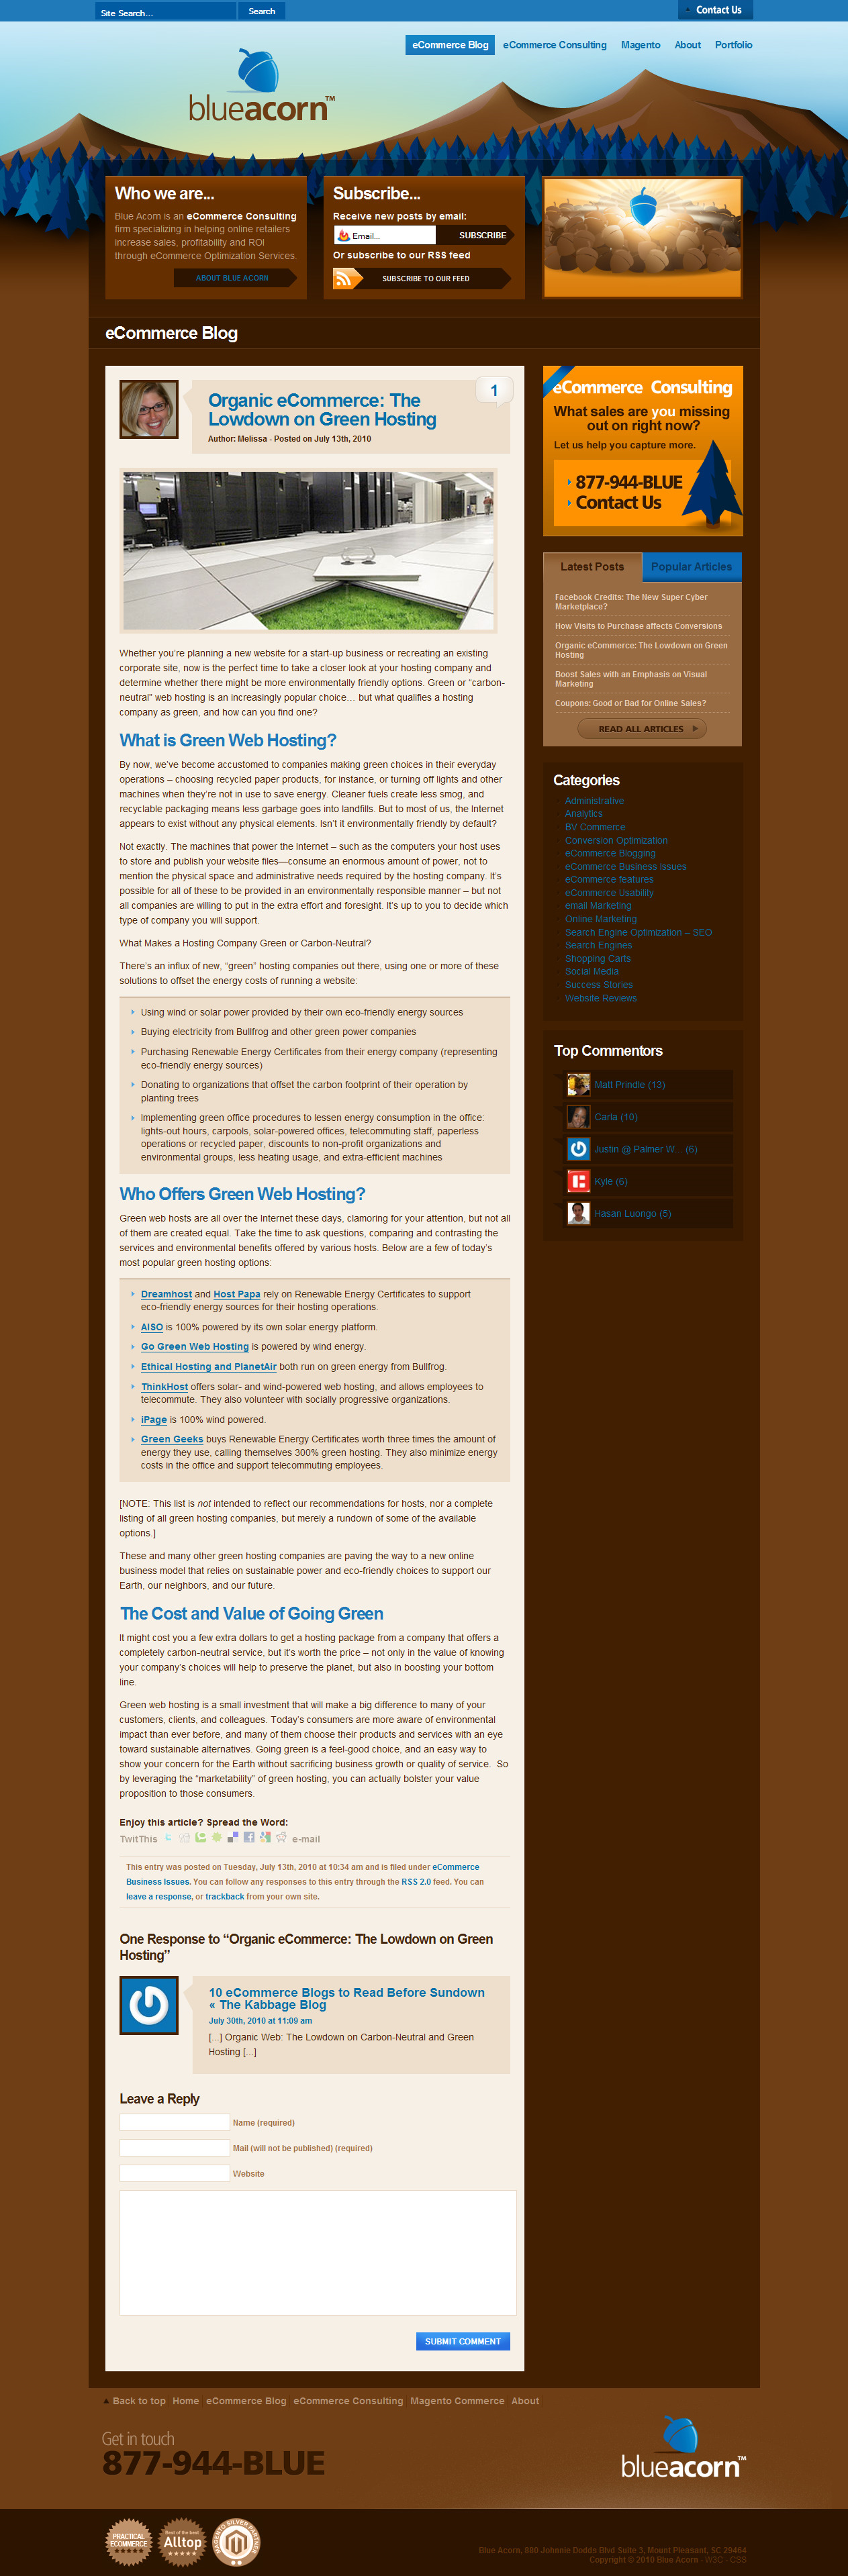 Ecommerce Article: Organic Ecommerce